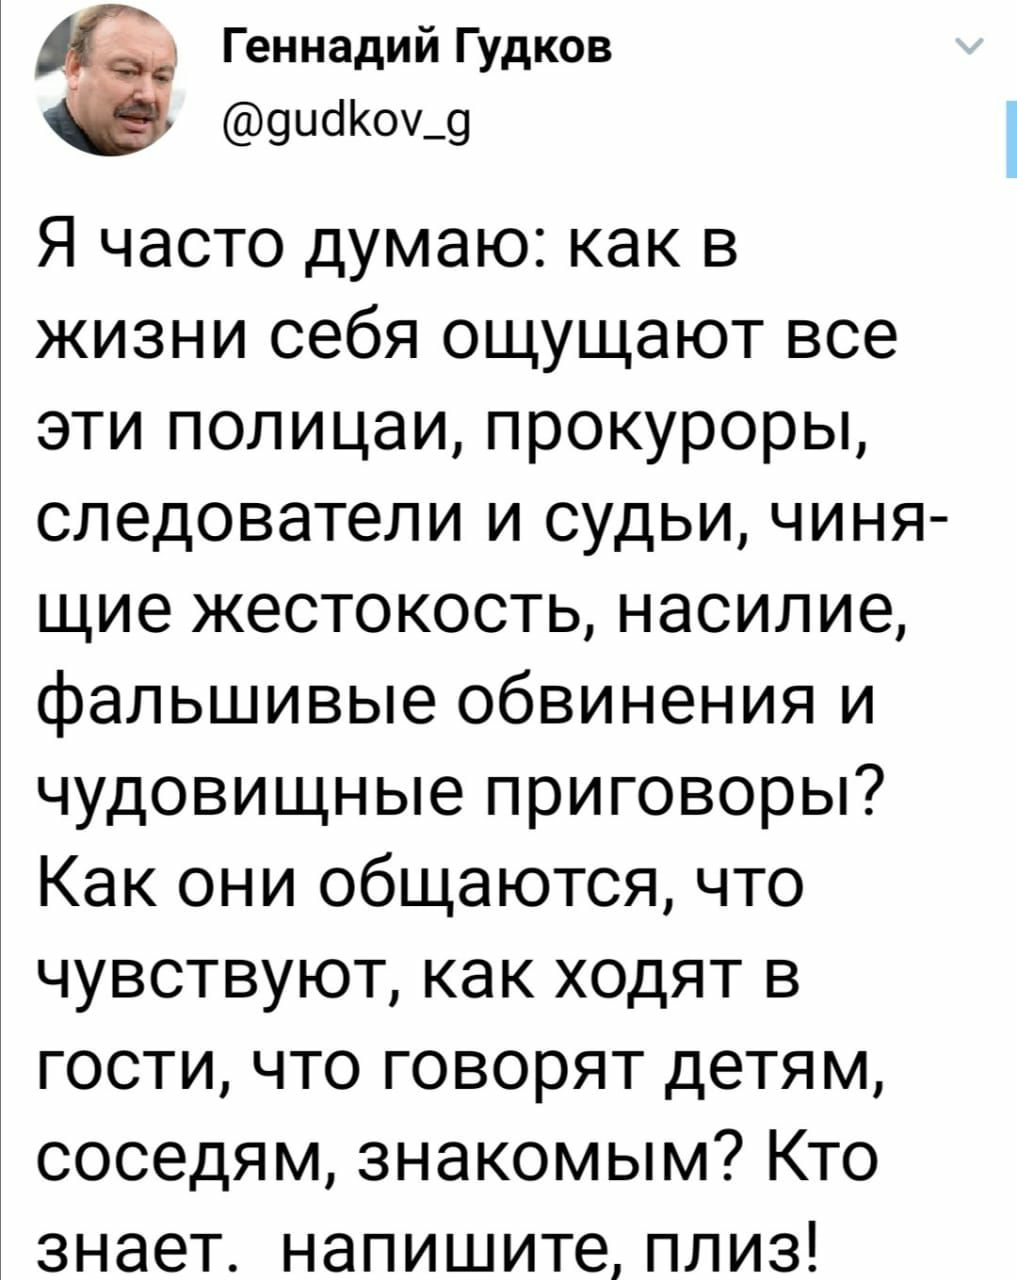 https://i3.imageban.ru/out/2020/03/01/ec8196cd7cb5f4001fa0a00377326bc2.jpg